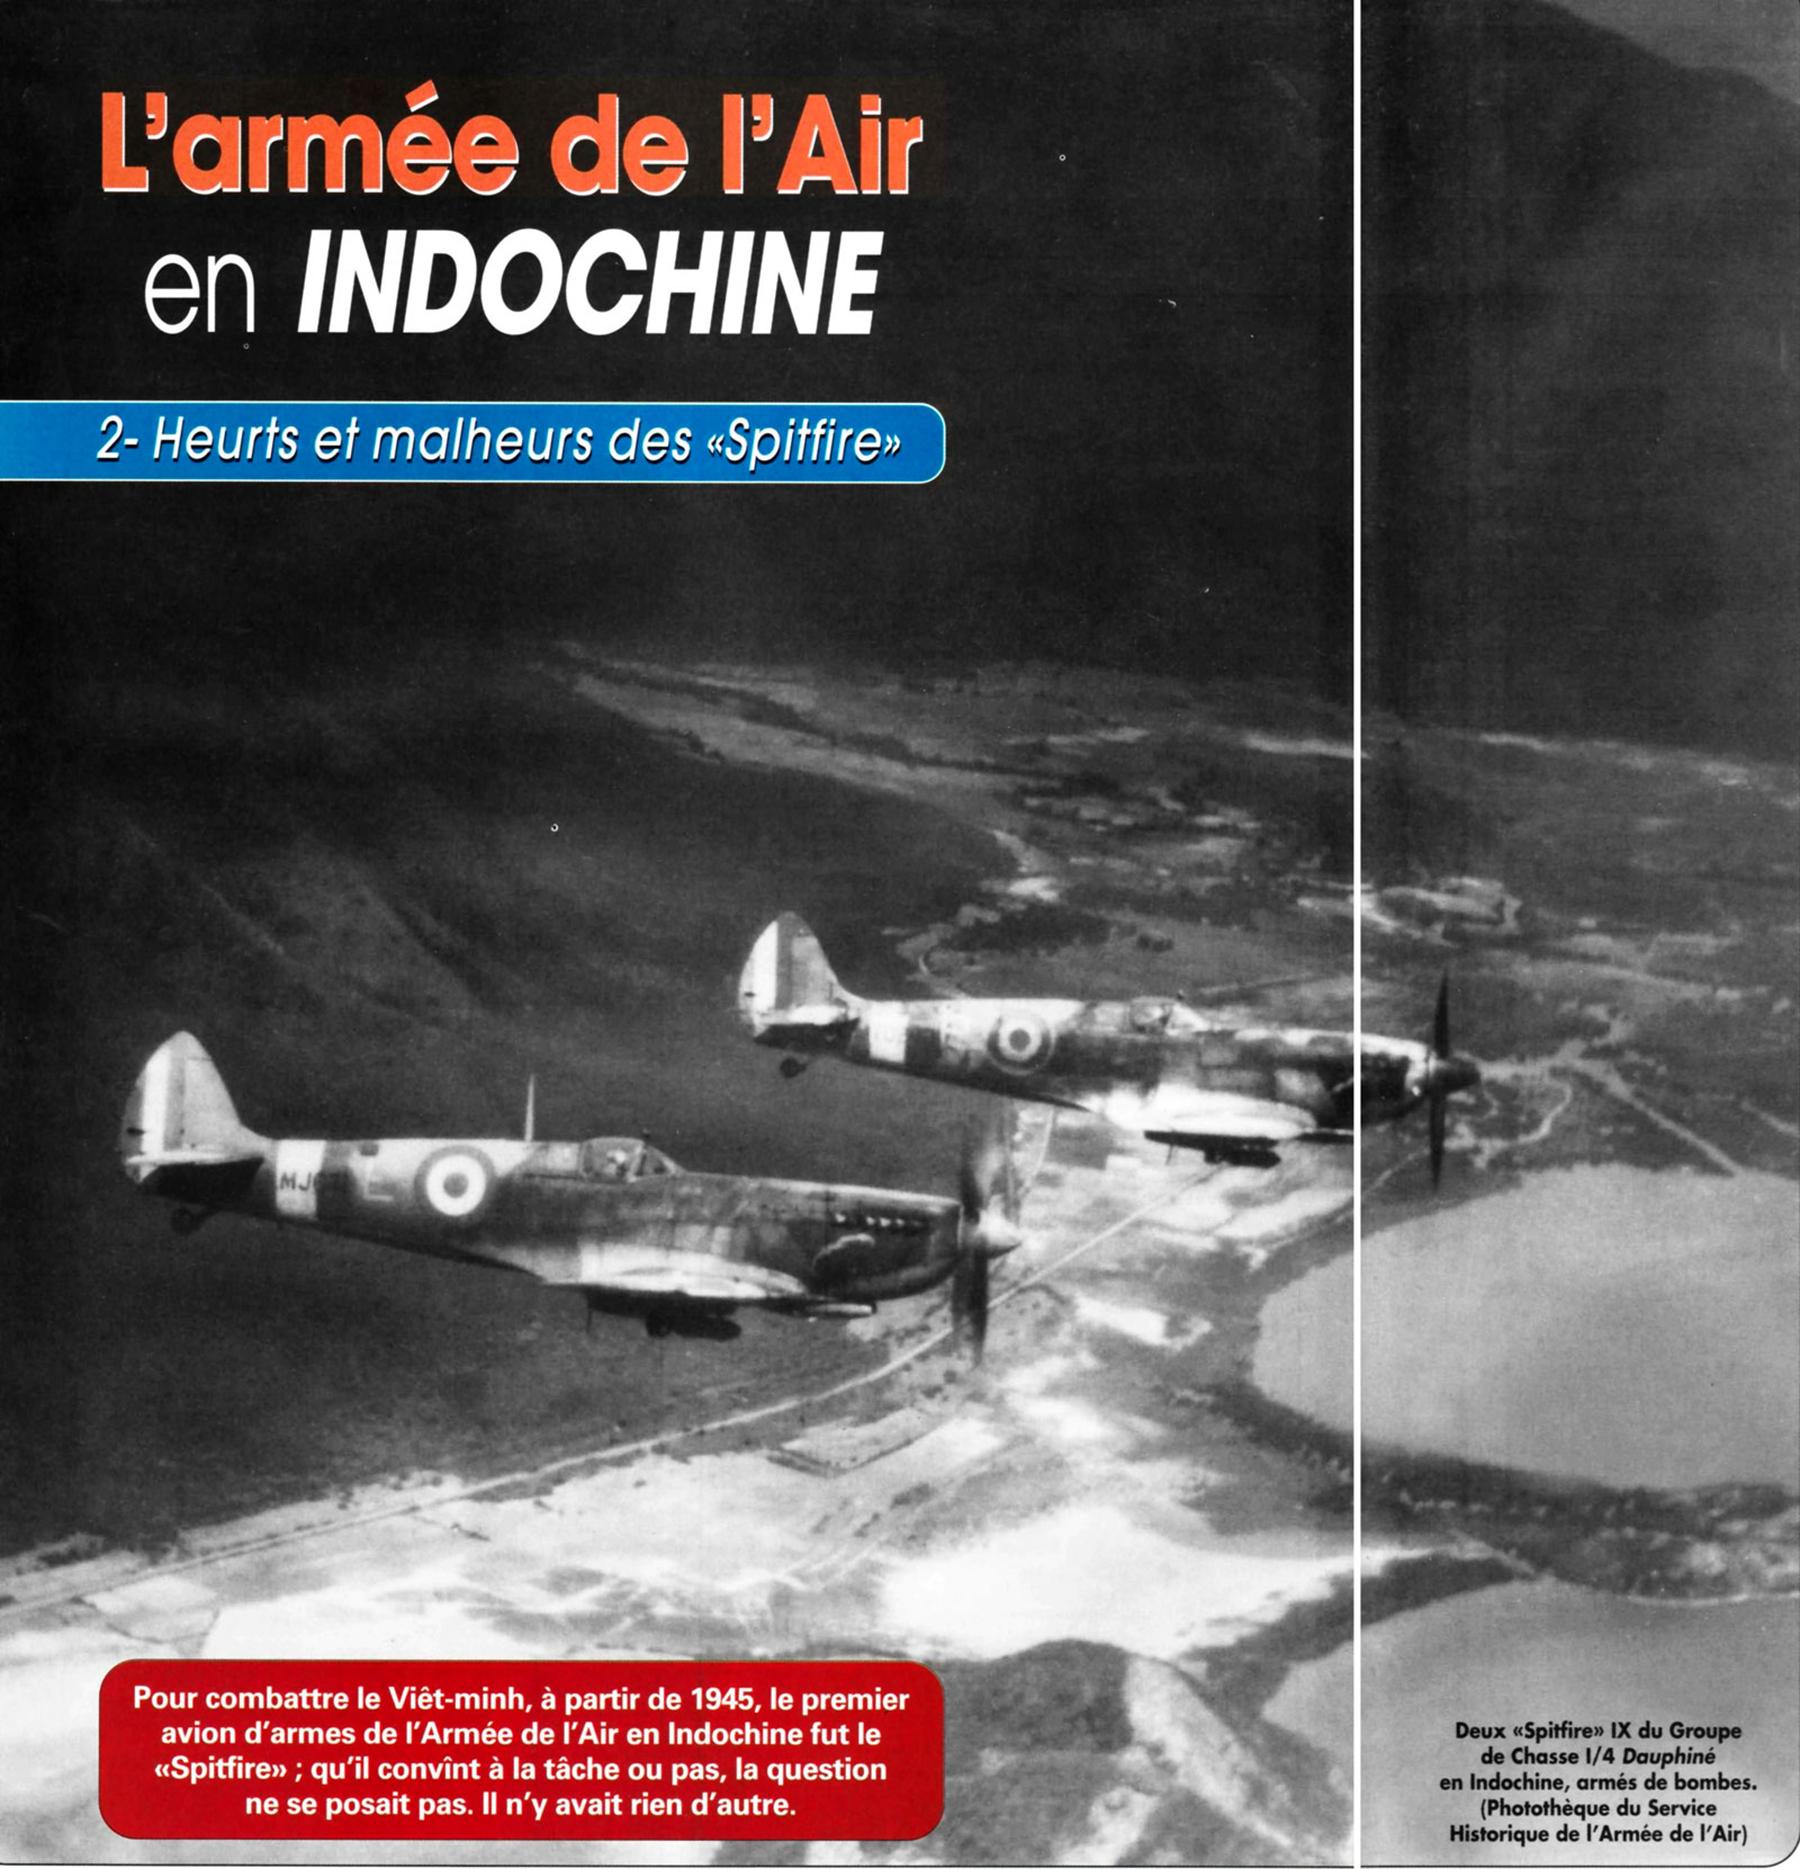 Spitfire MkIX FAF 1.4 Dauphine White E MJ671 over Indo China 01